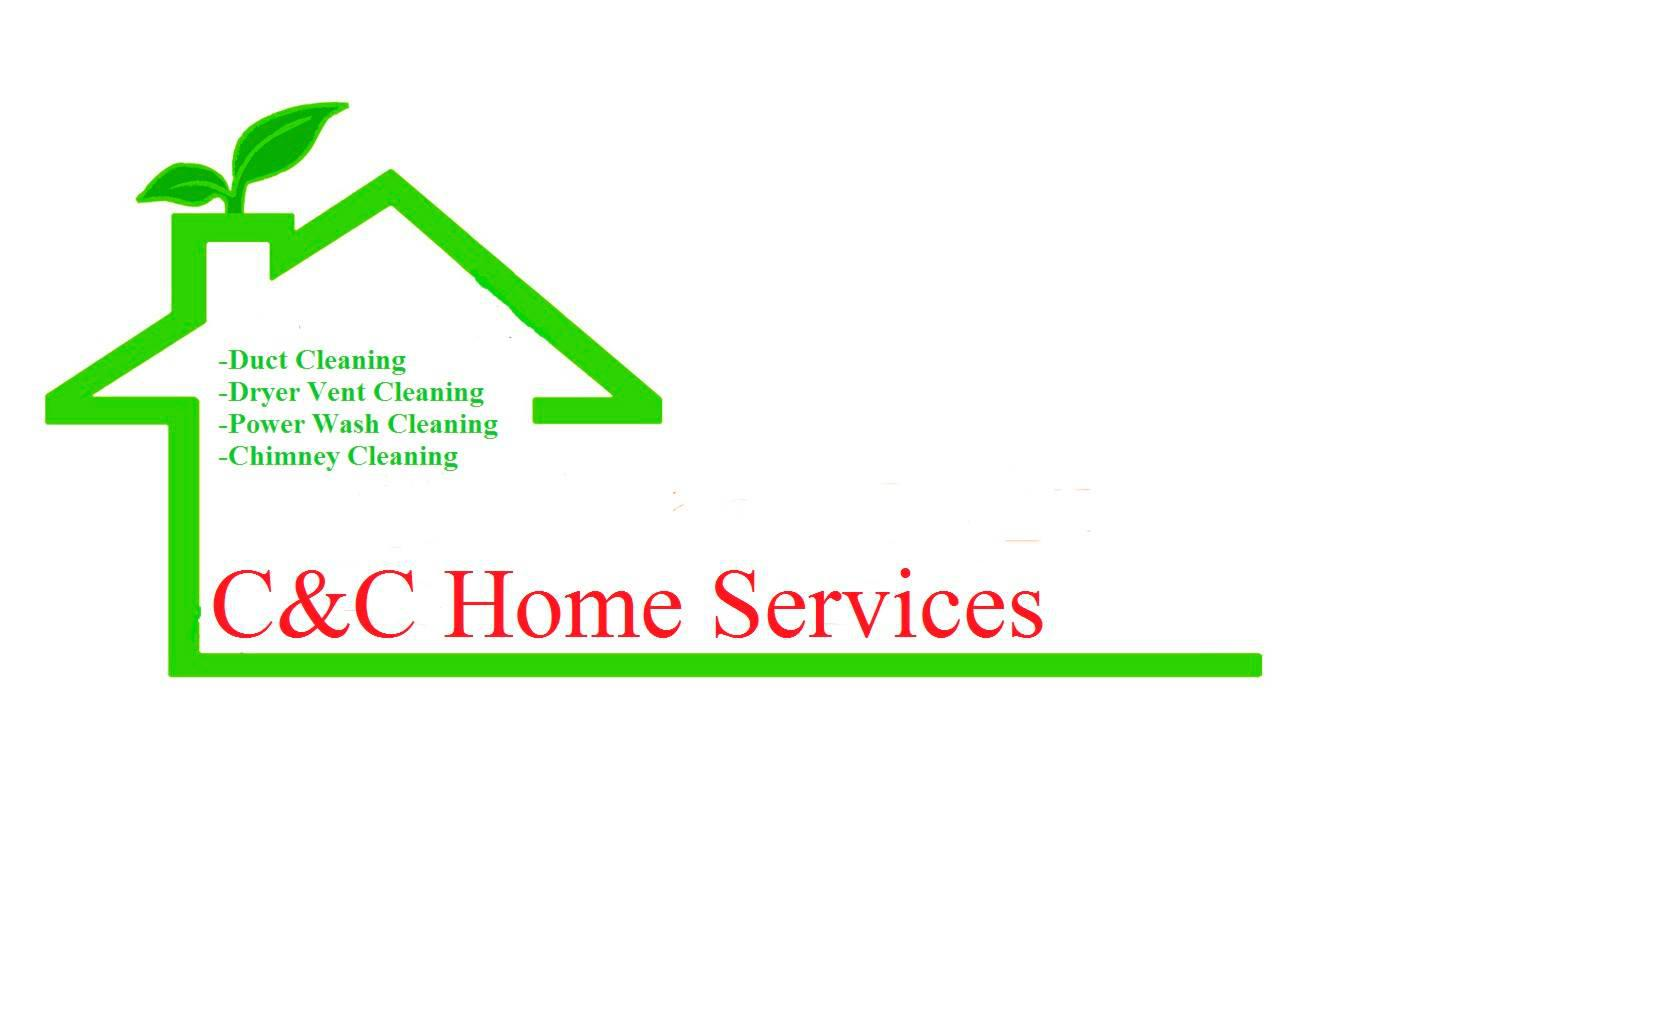 C&C Home Services, LLC image 1